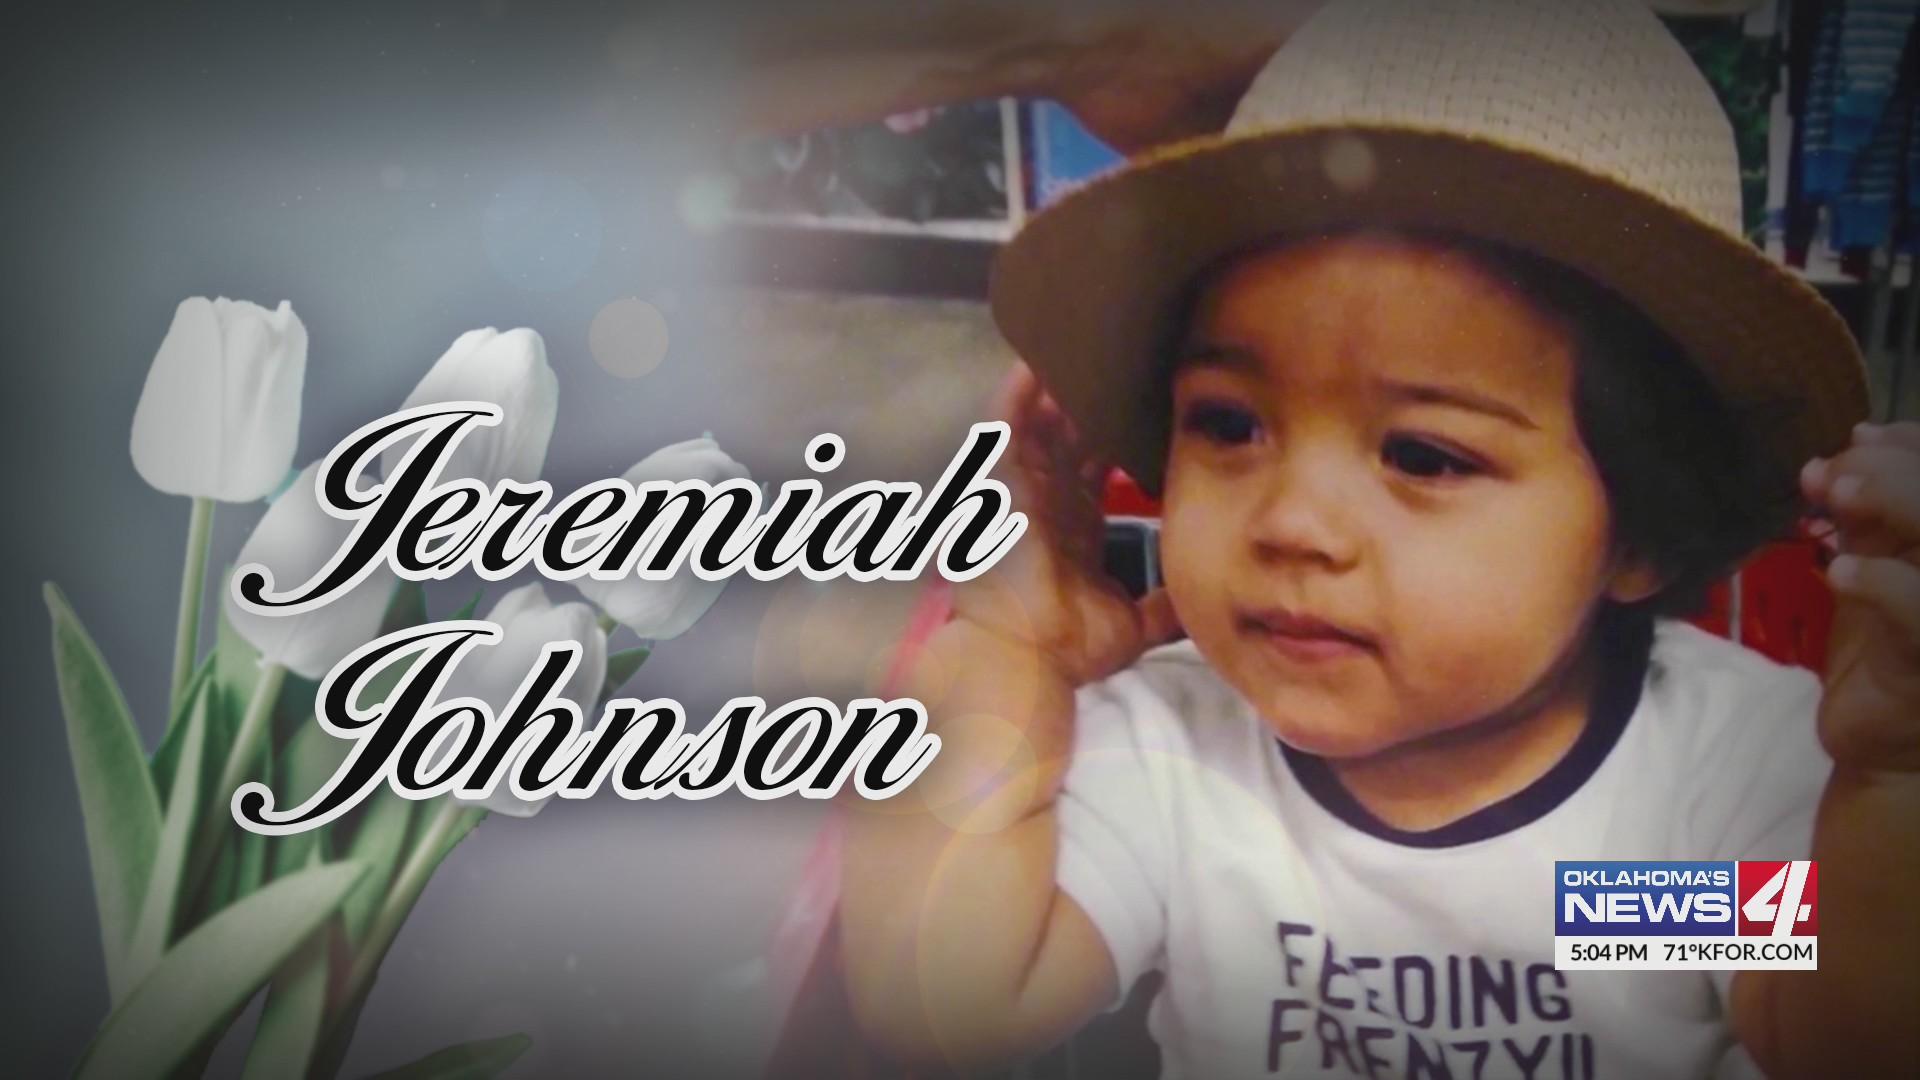 Jeremiah Johnson in memoriam